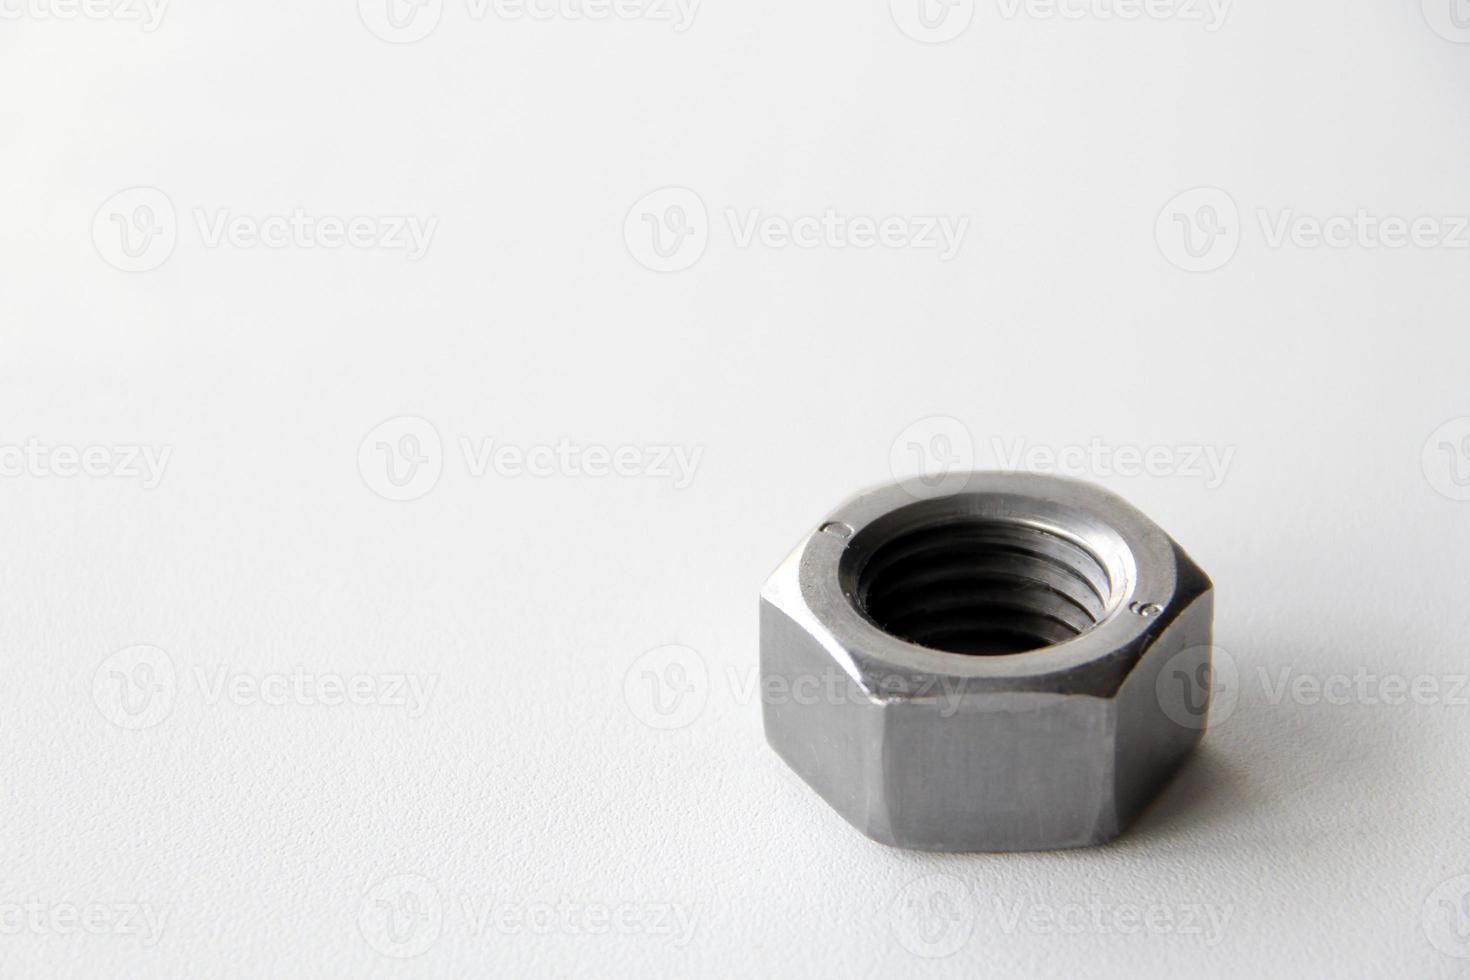 Nut Metal photo